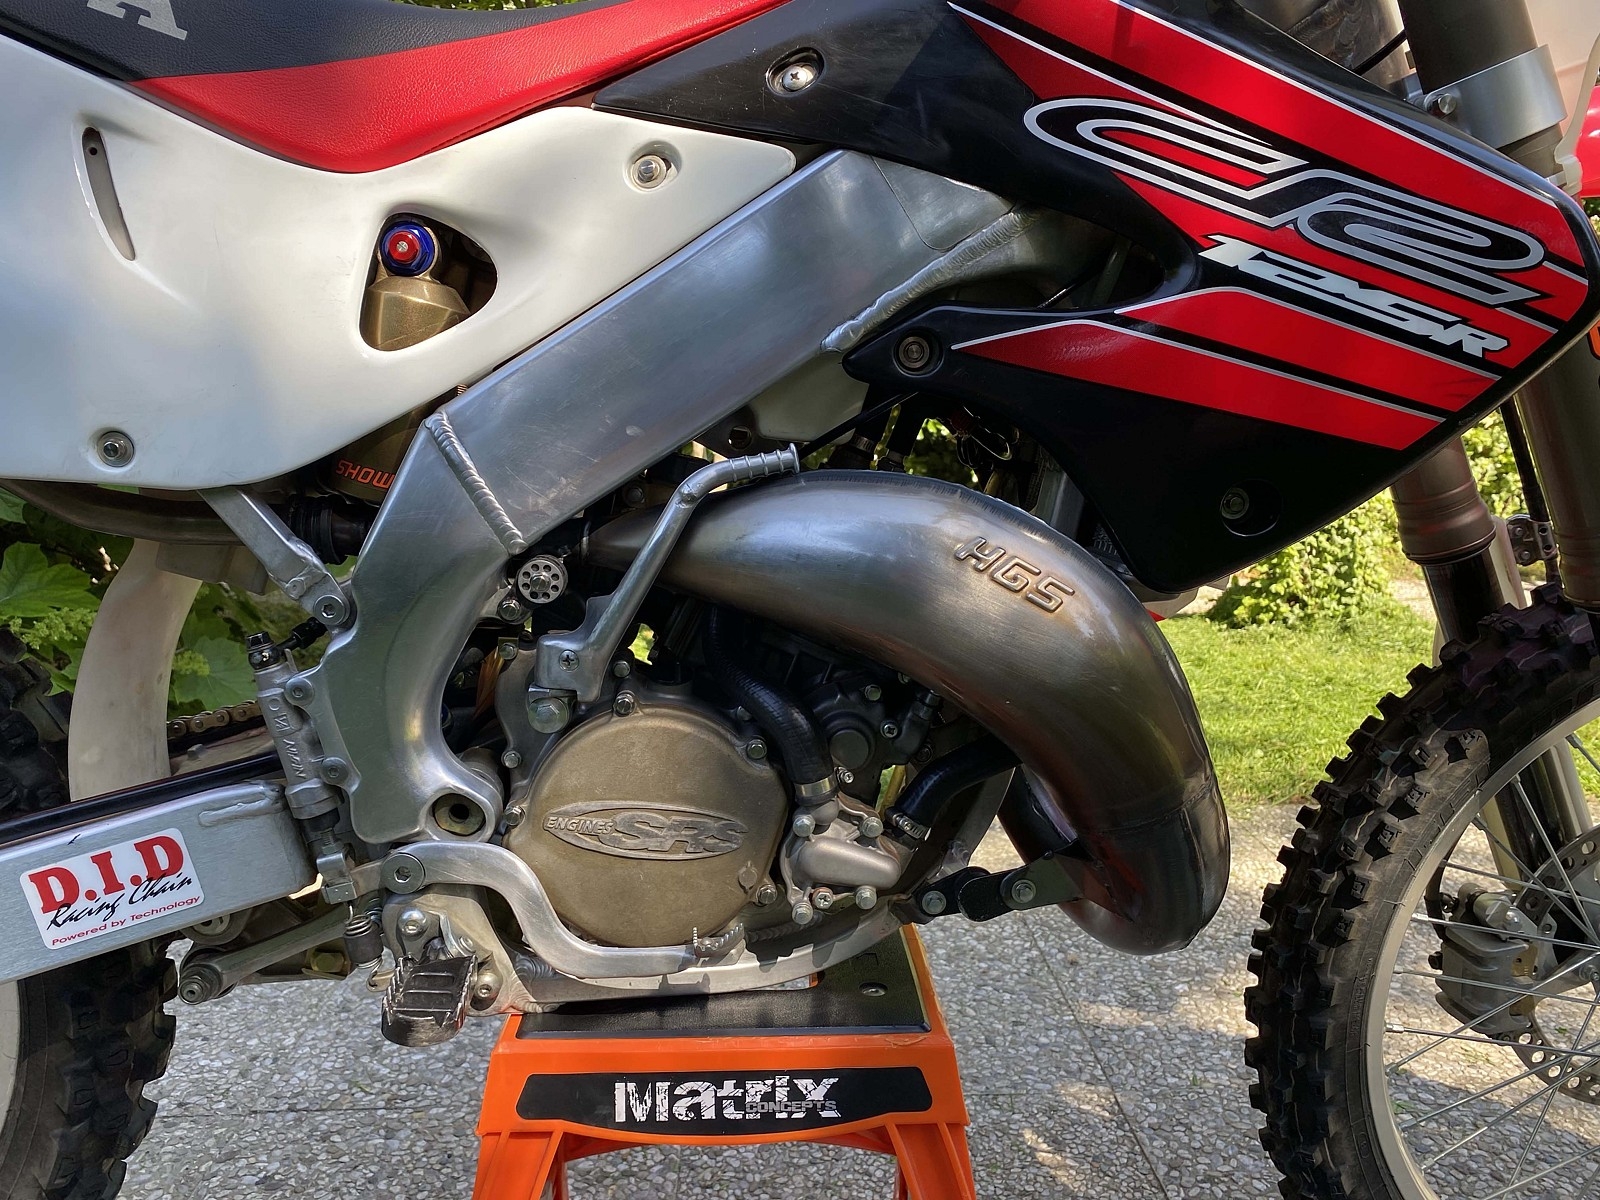 DRSideOK Magnesium Cover SRS - Debegio - Motocross Pictures - Vital MX